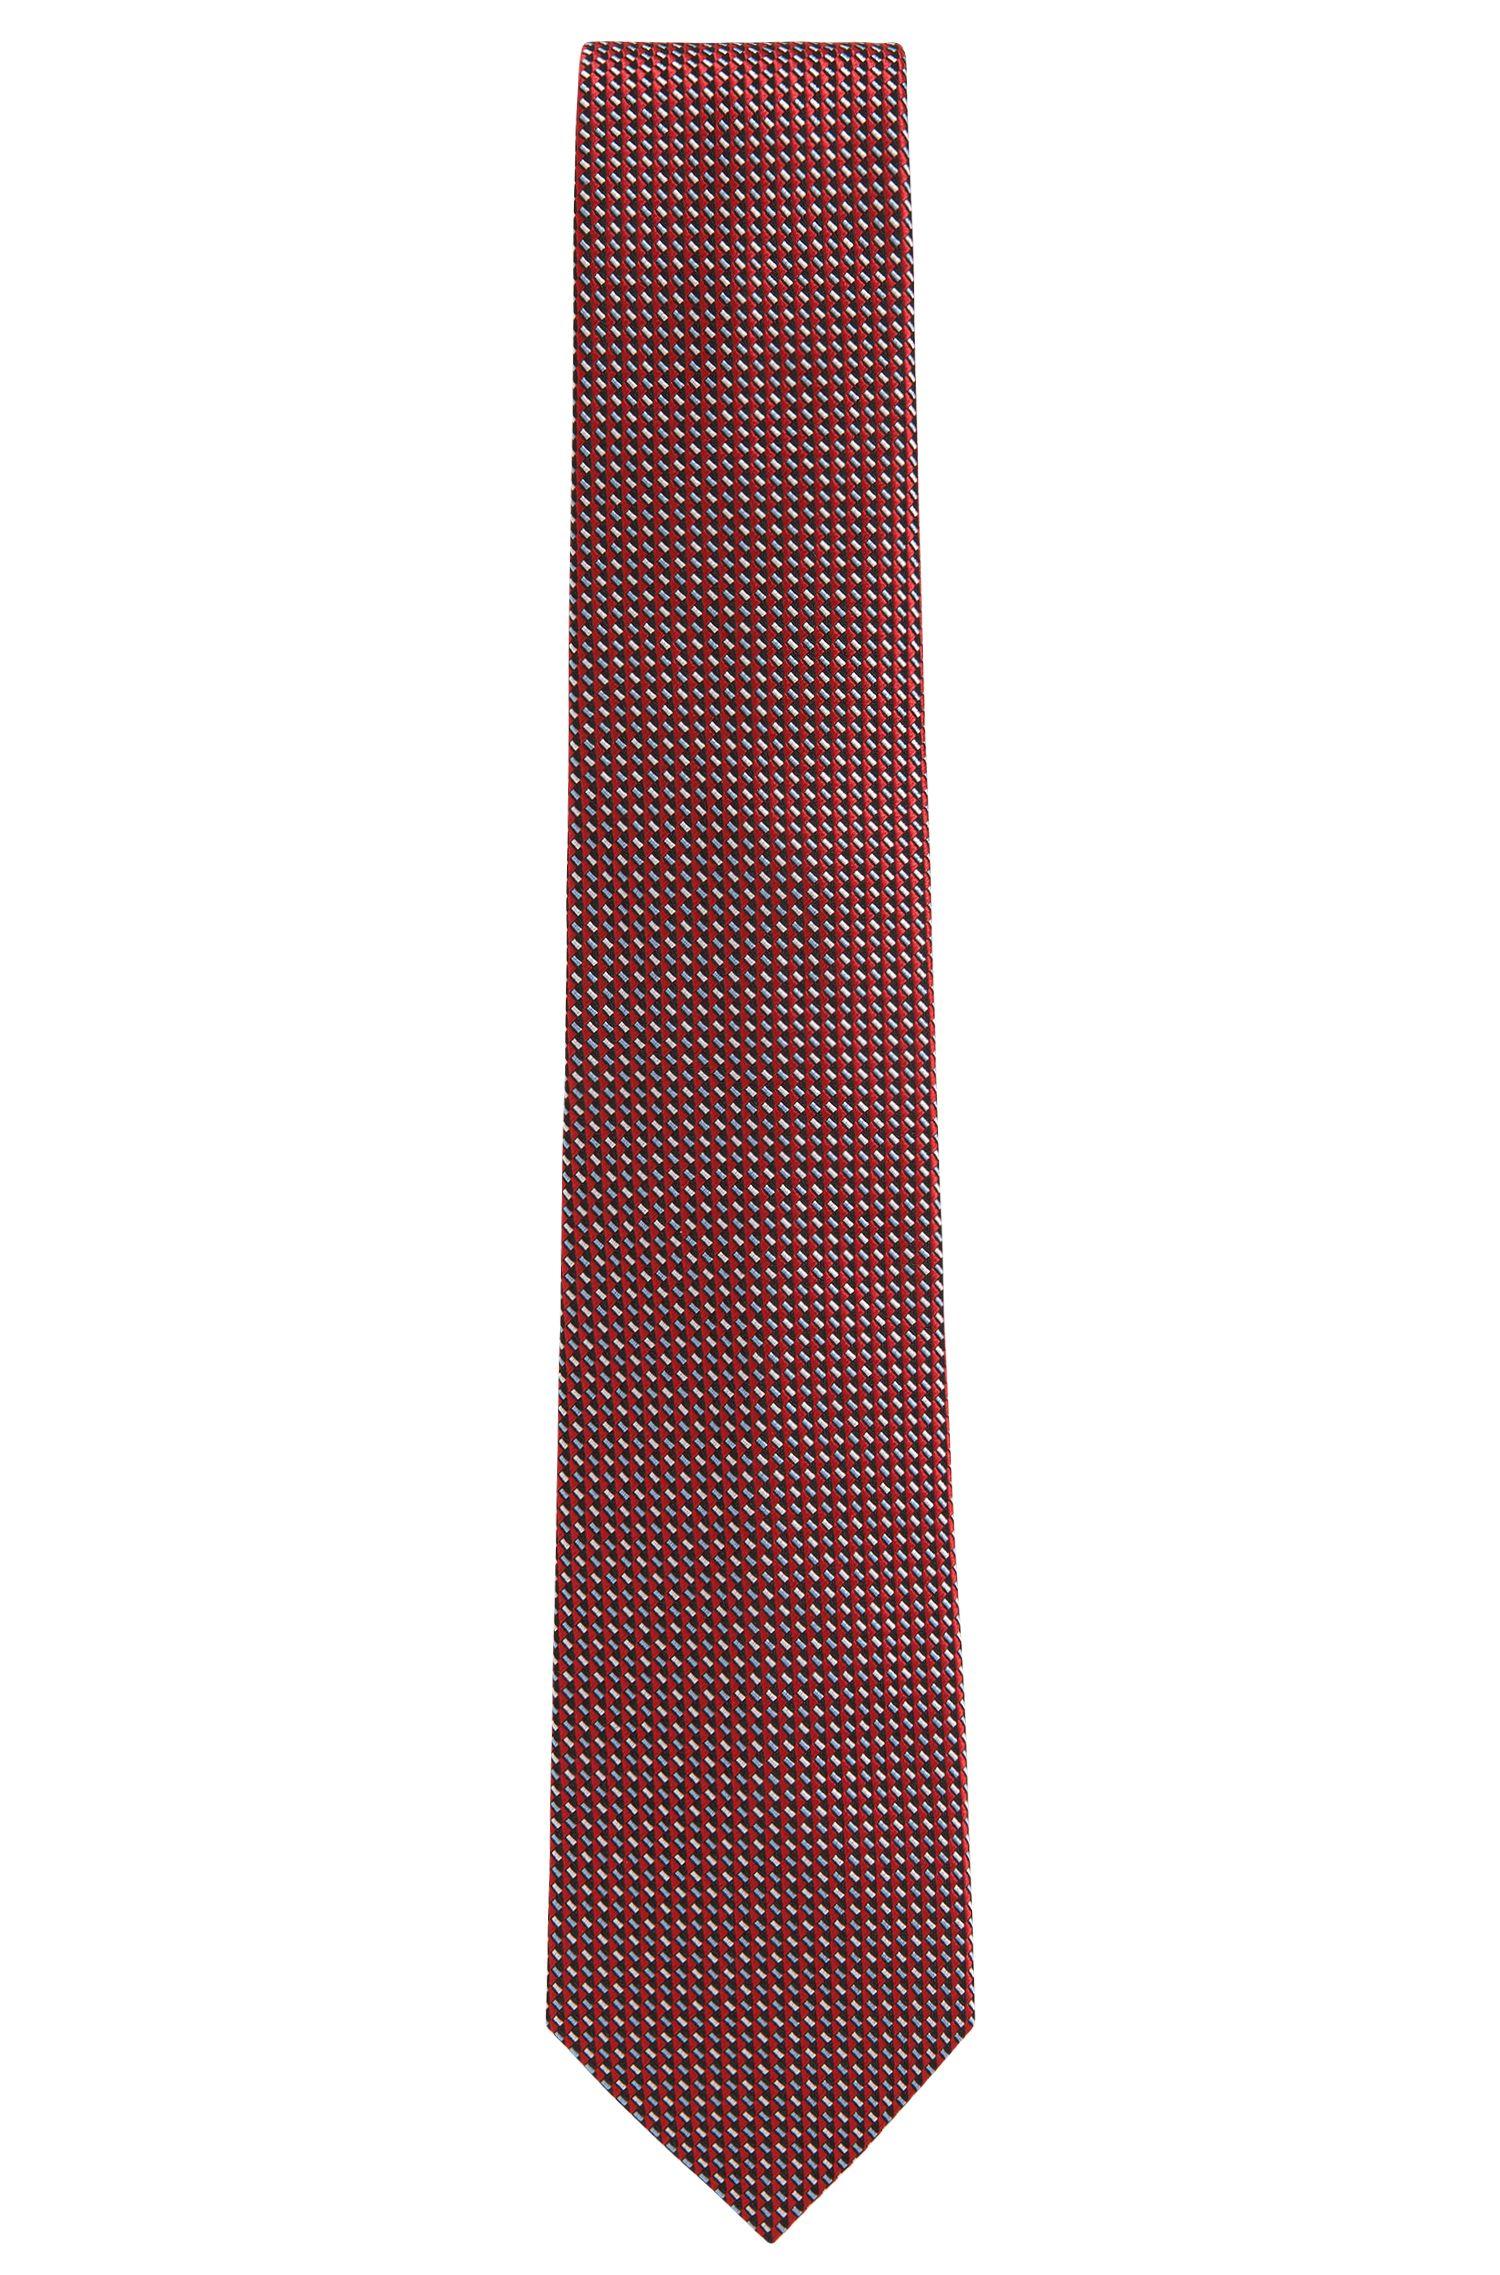 BOSS Tailored Geometric Italian Silk Tie